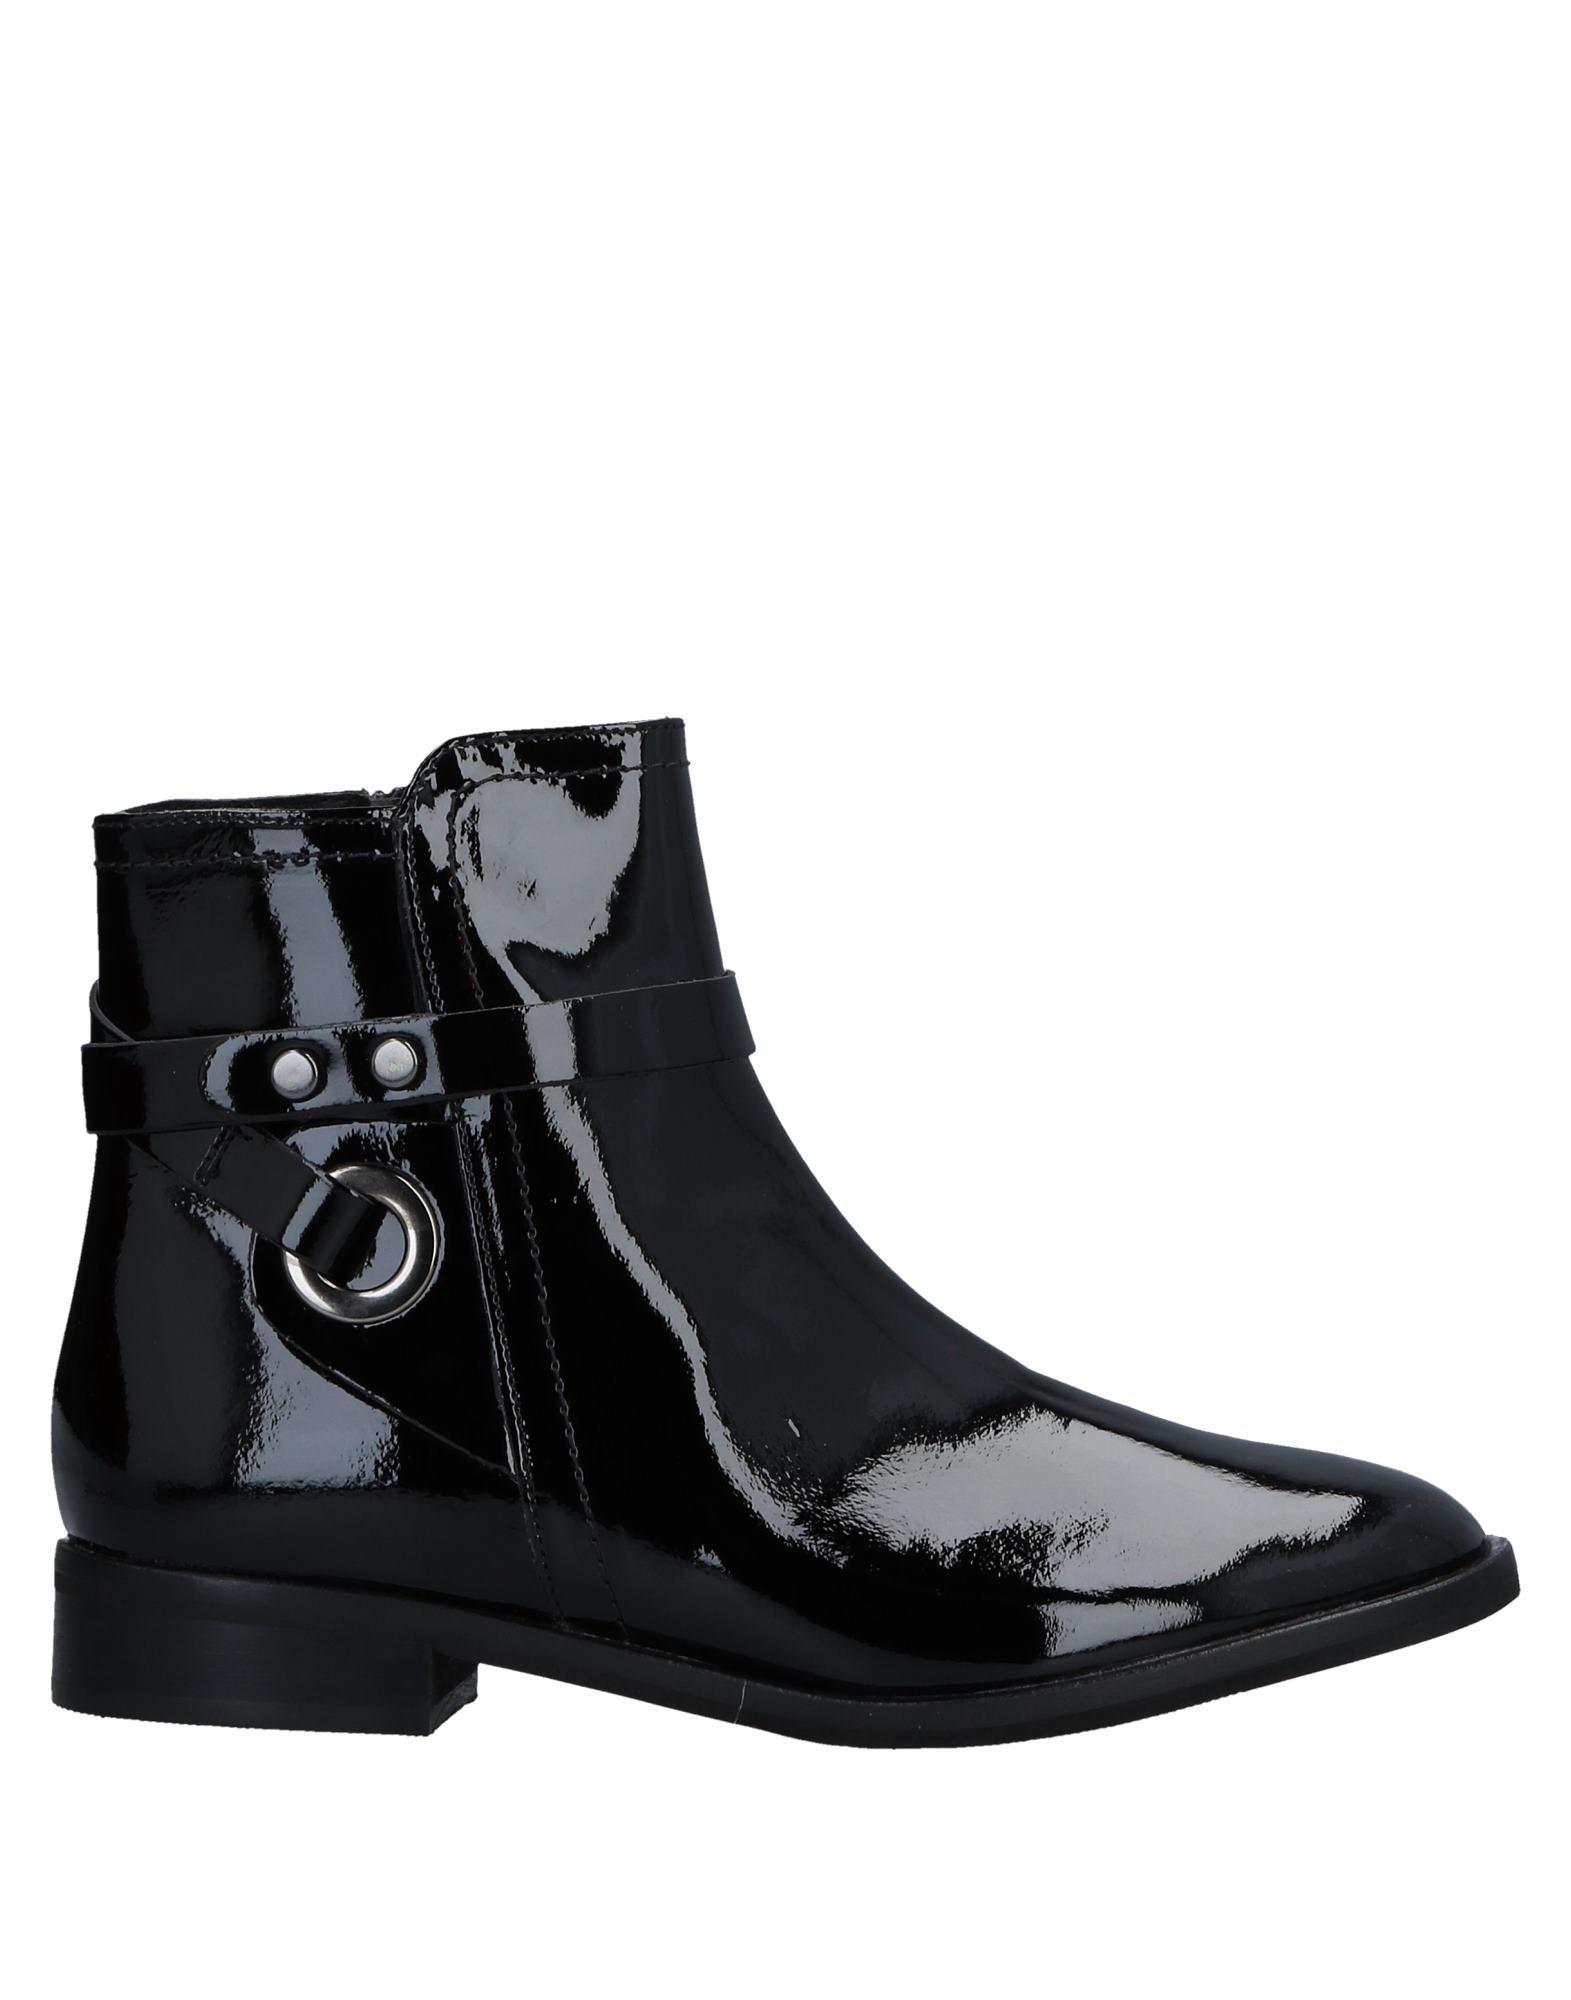 Giorgio Picino Stiefelette Damen  11522539XH Gute Qualität beliebte Schuhe